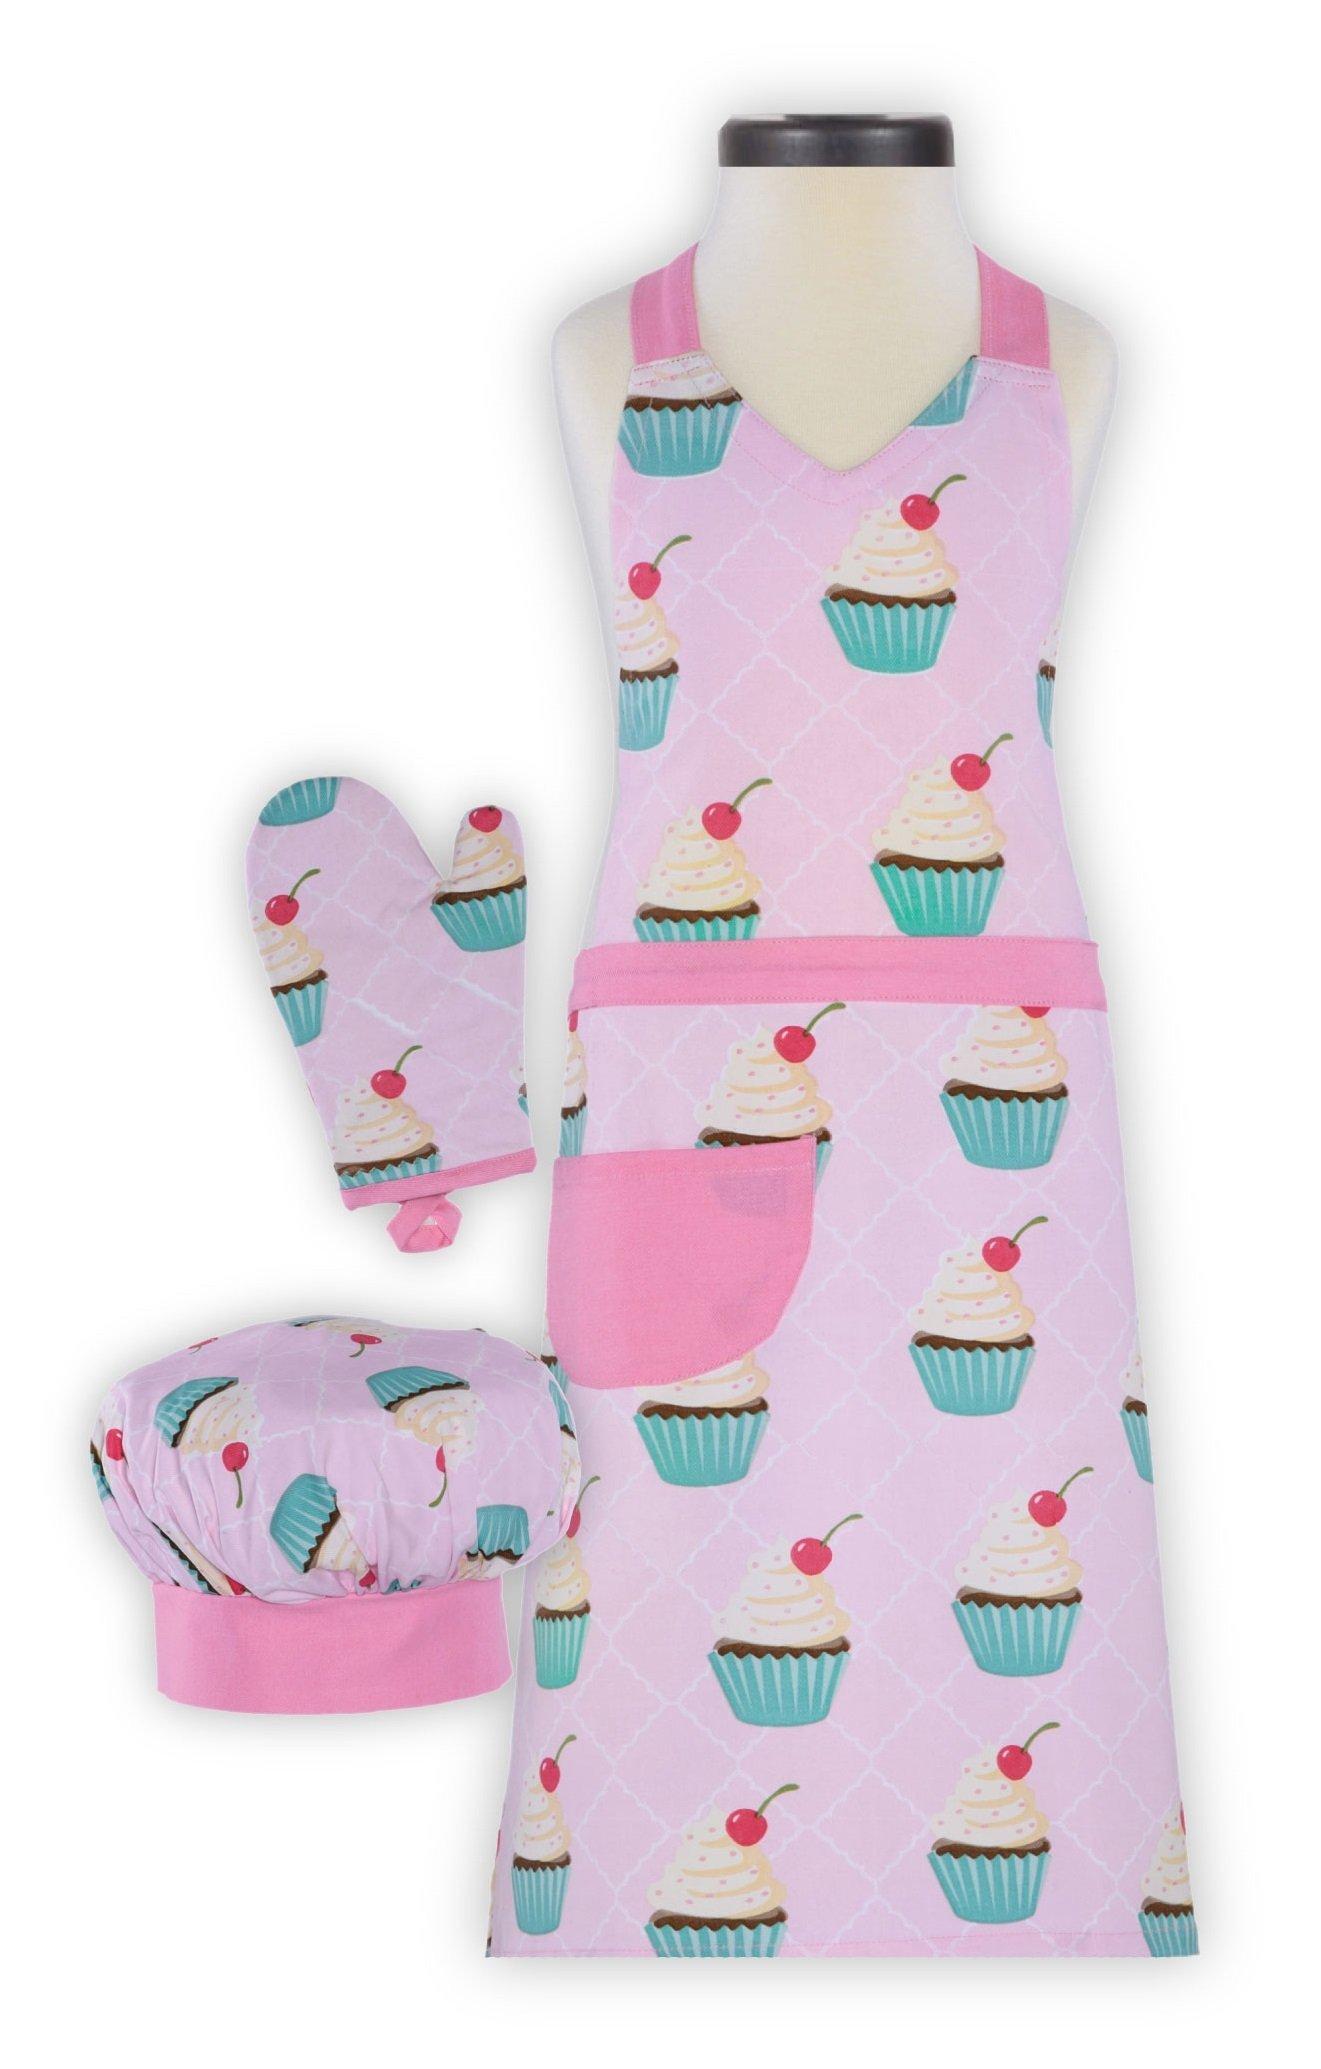 Handstand Kitchen Child's Cupcake Delight 100% Cotton Apron, Mitt and Chef's Hat Gift Set